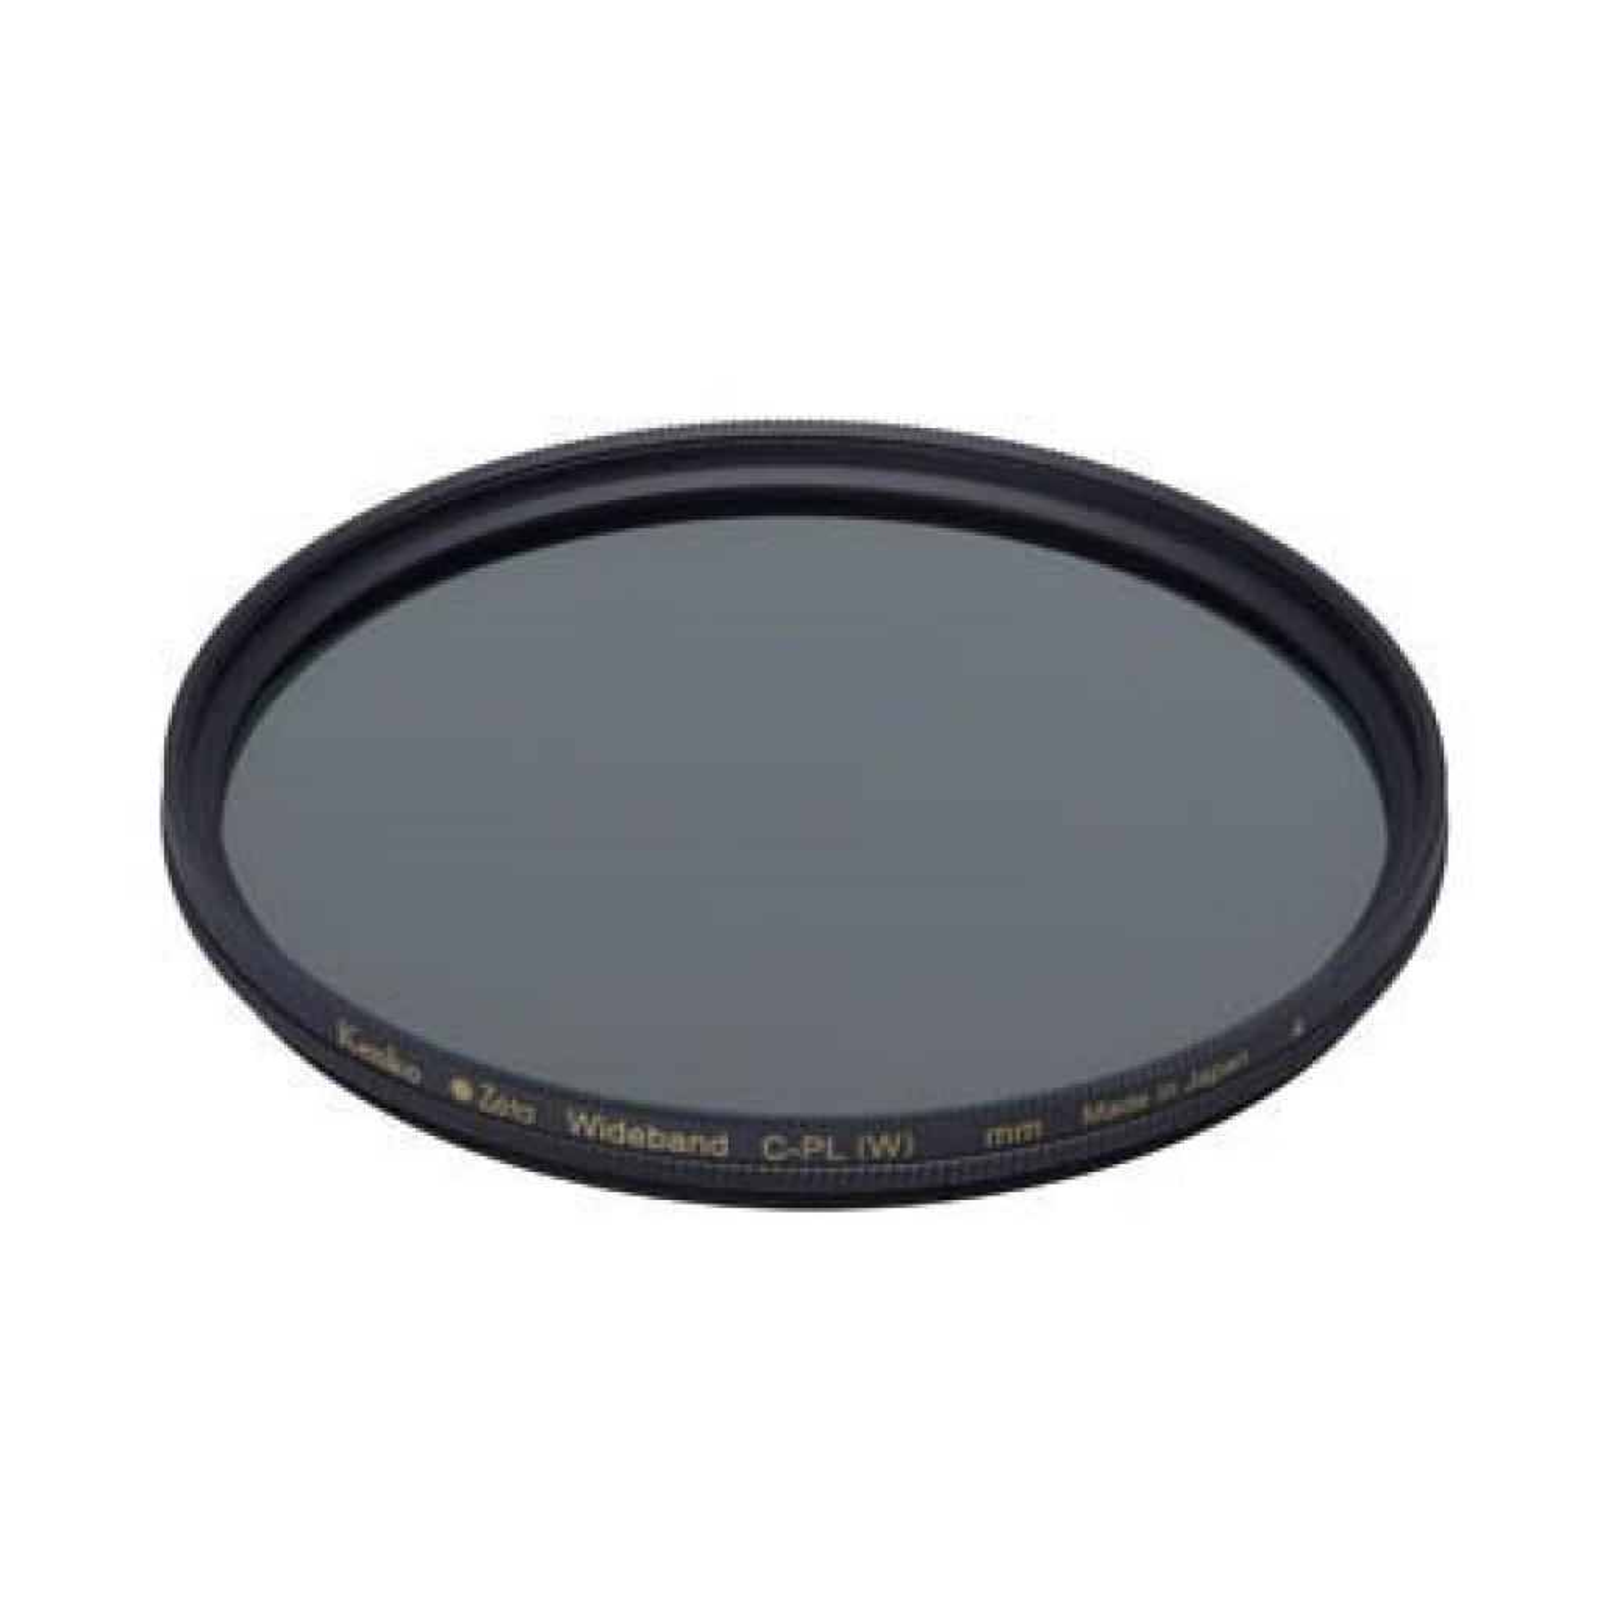 Светофильтр Kenko E-CPL 49mm (38344)